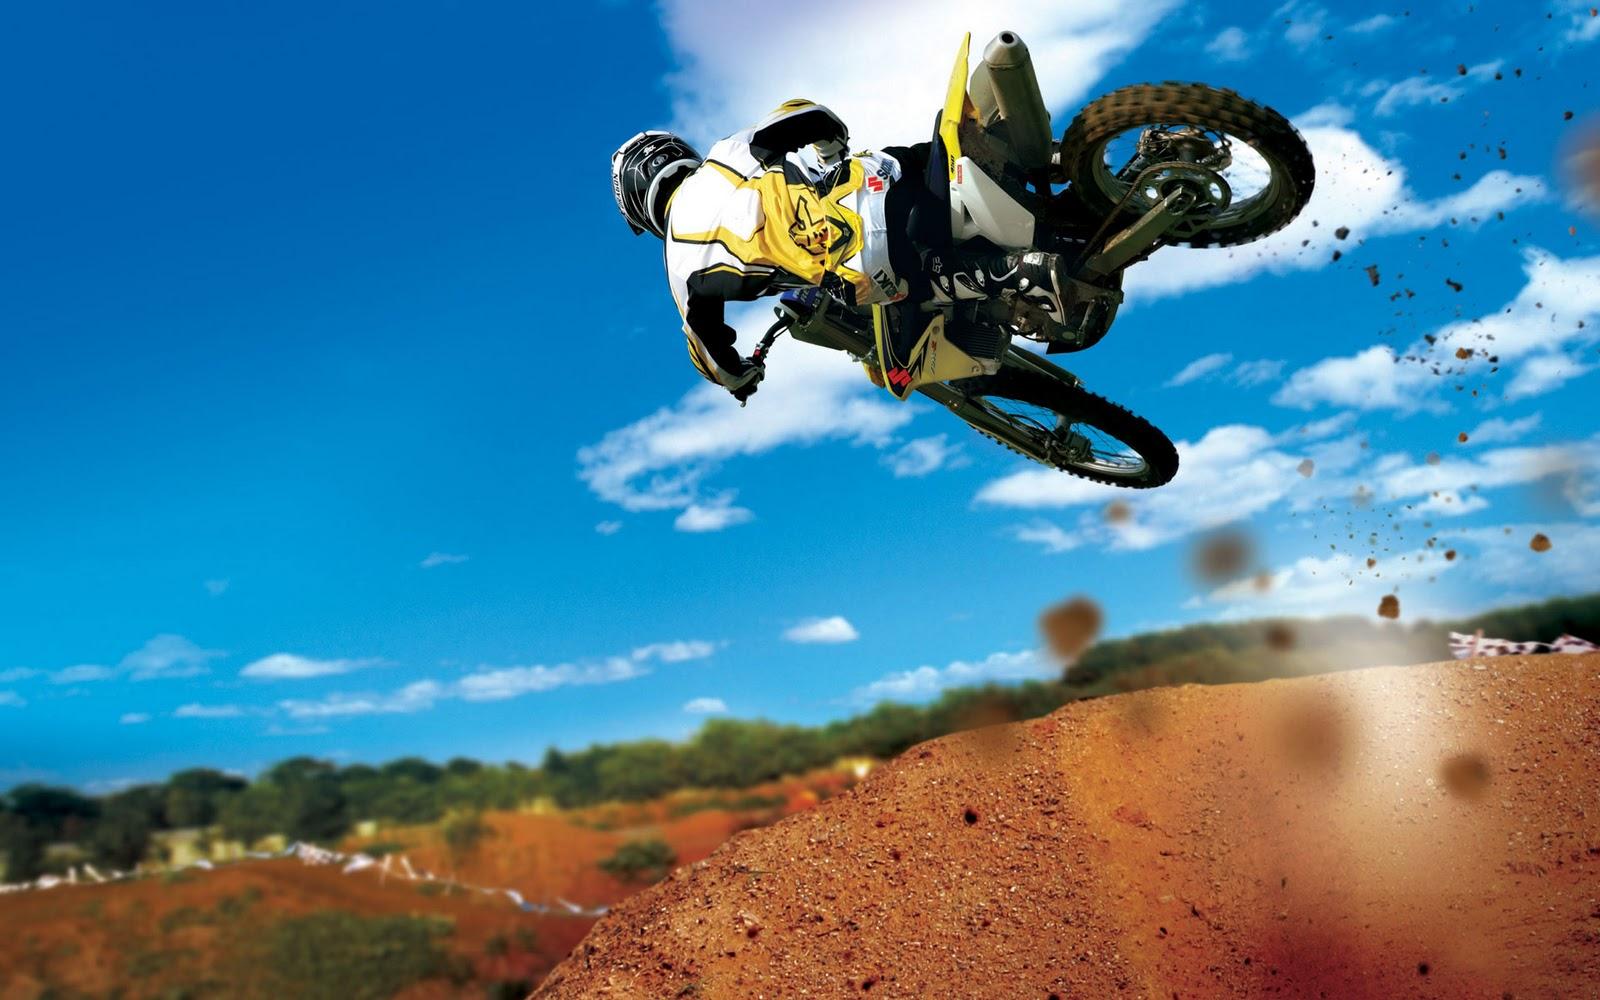 http://2.bp.blogspot.com/-w0G3sd7UhEQ/TrIX9kkNAsI/AAAAAAAAAaU/p_k9o1RvVfA/s1600/6267-motocross-amazing-hd-wallpapers.jpg